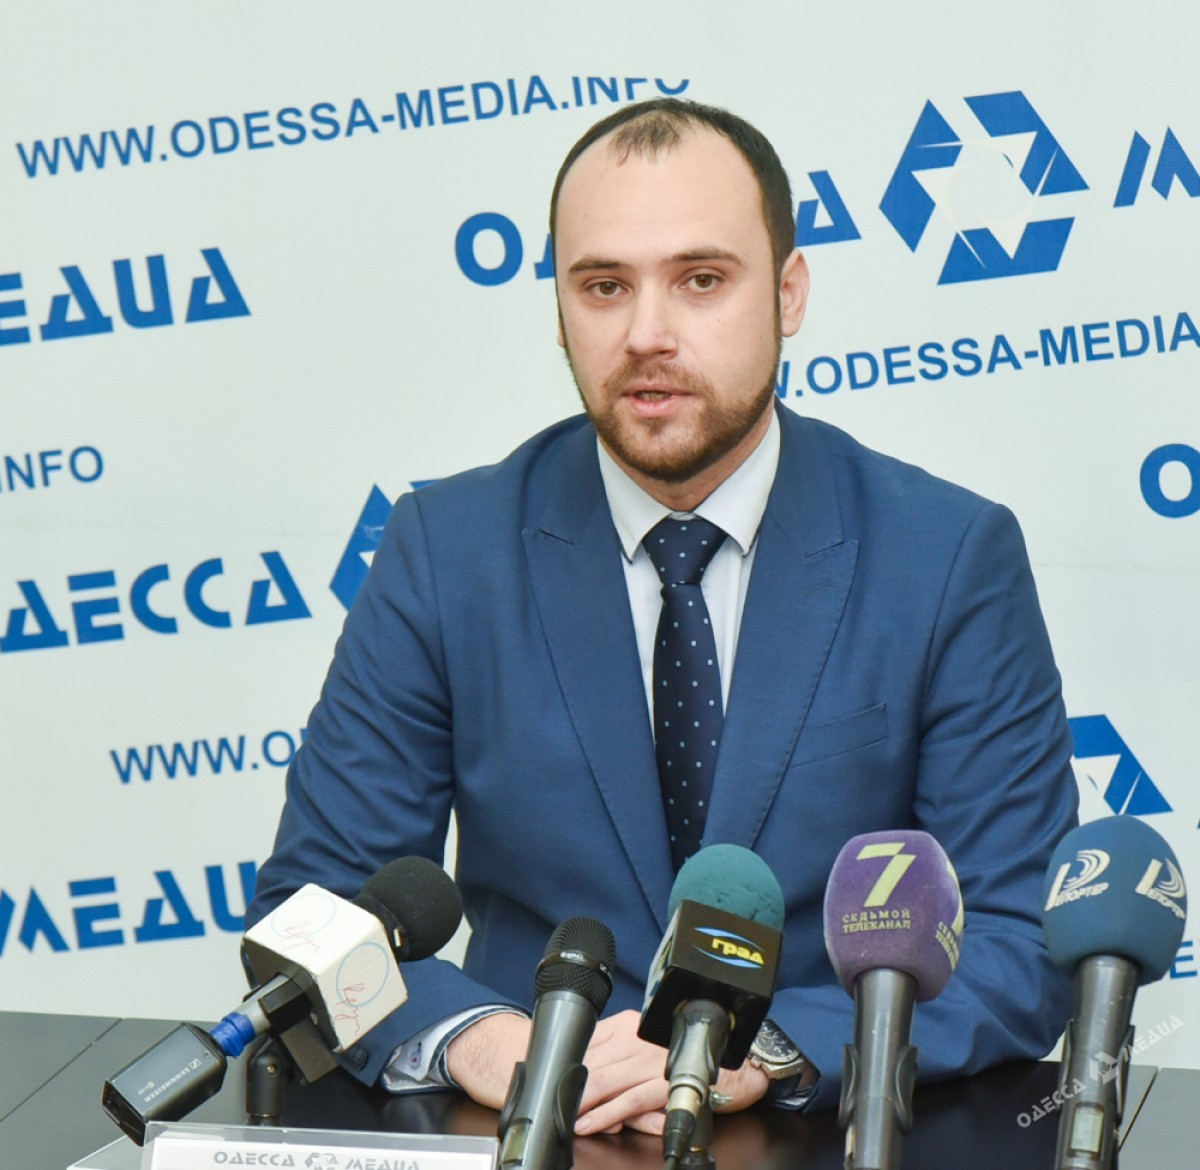 5fb1558ab3ef06bdad42f48c4f29758b Одесские эксперты готовятся к доллару по 40 гривен